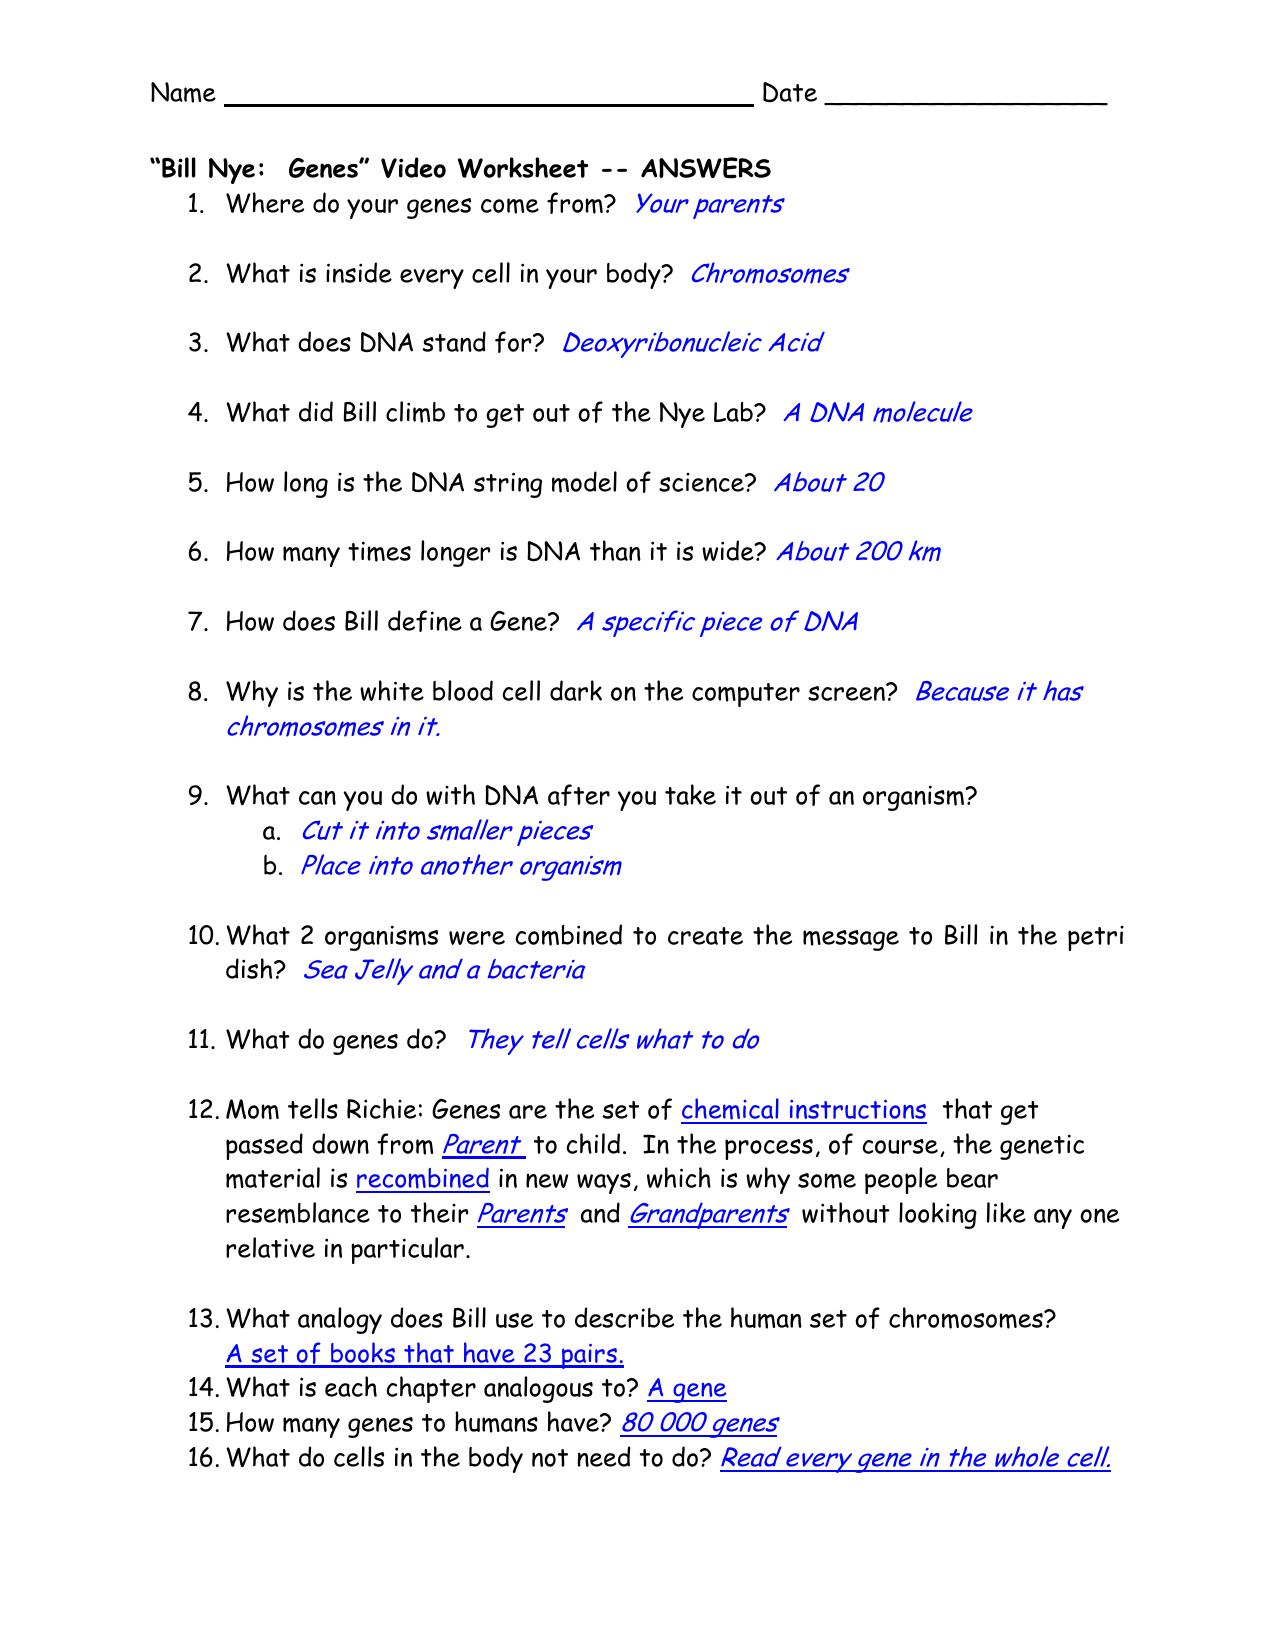 Bill Nye Genes Video Worksheet Answers